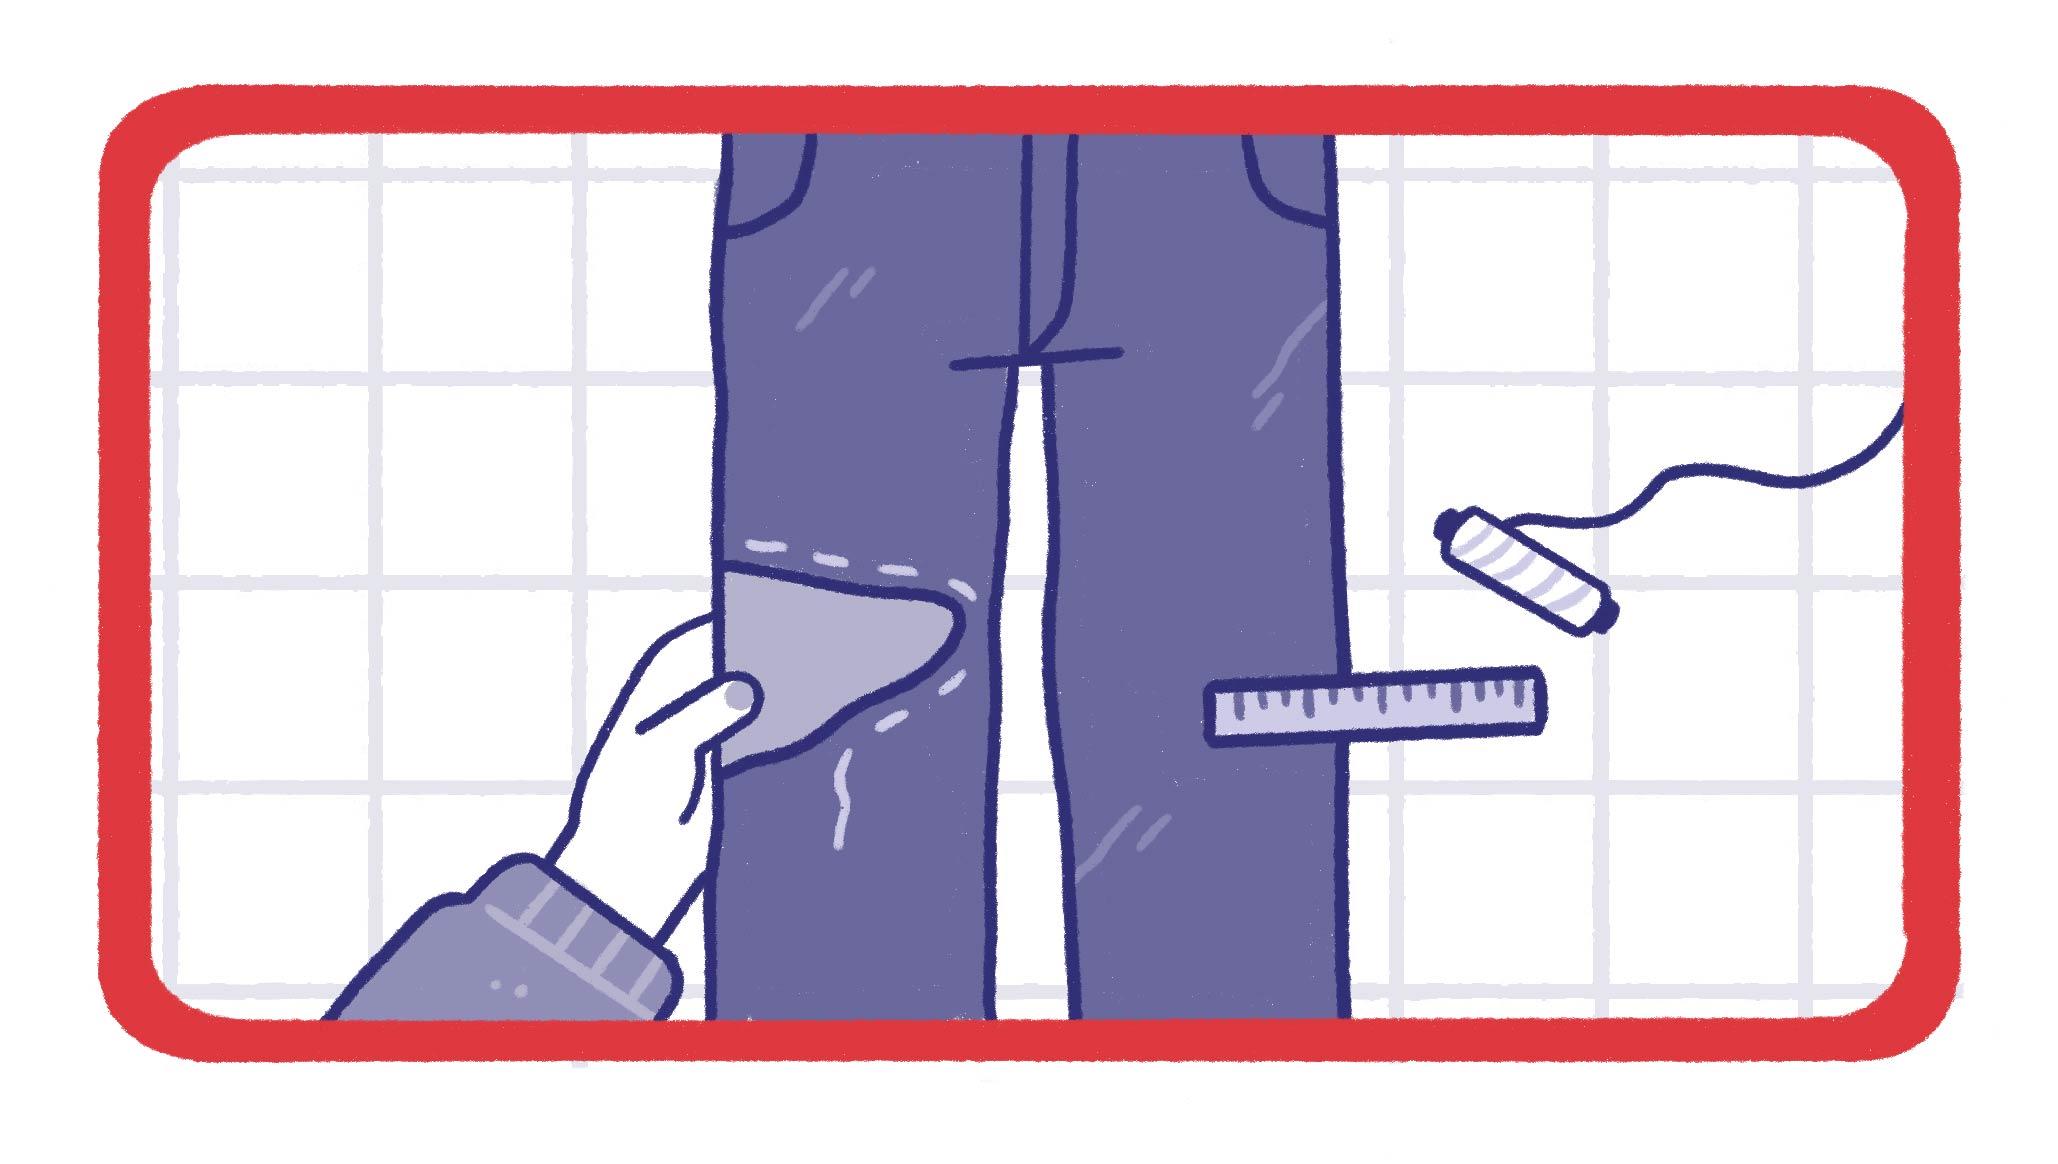 a pair of jeans with sashiko stitches